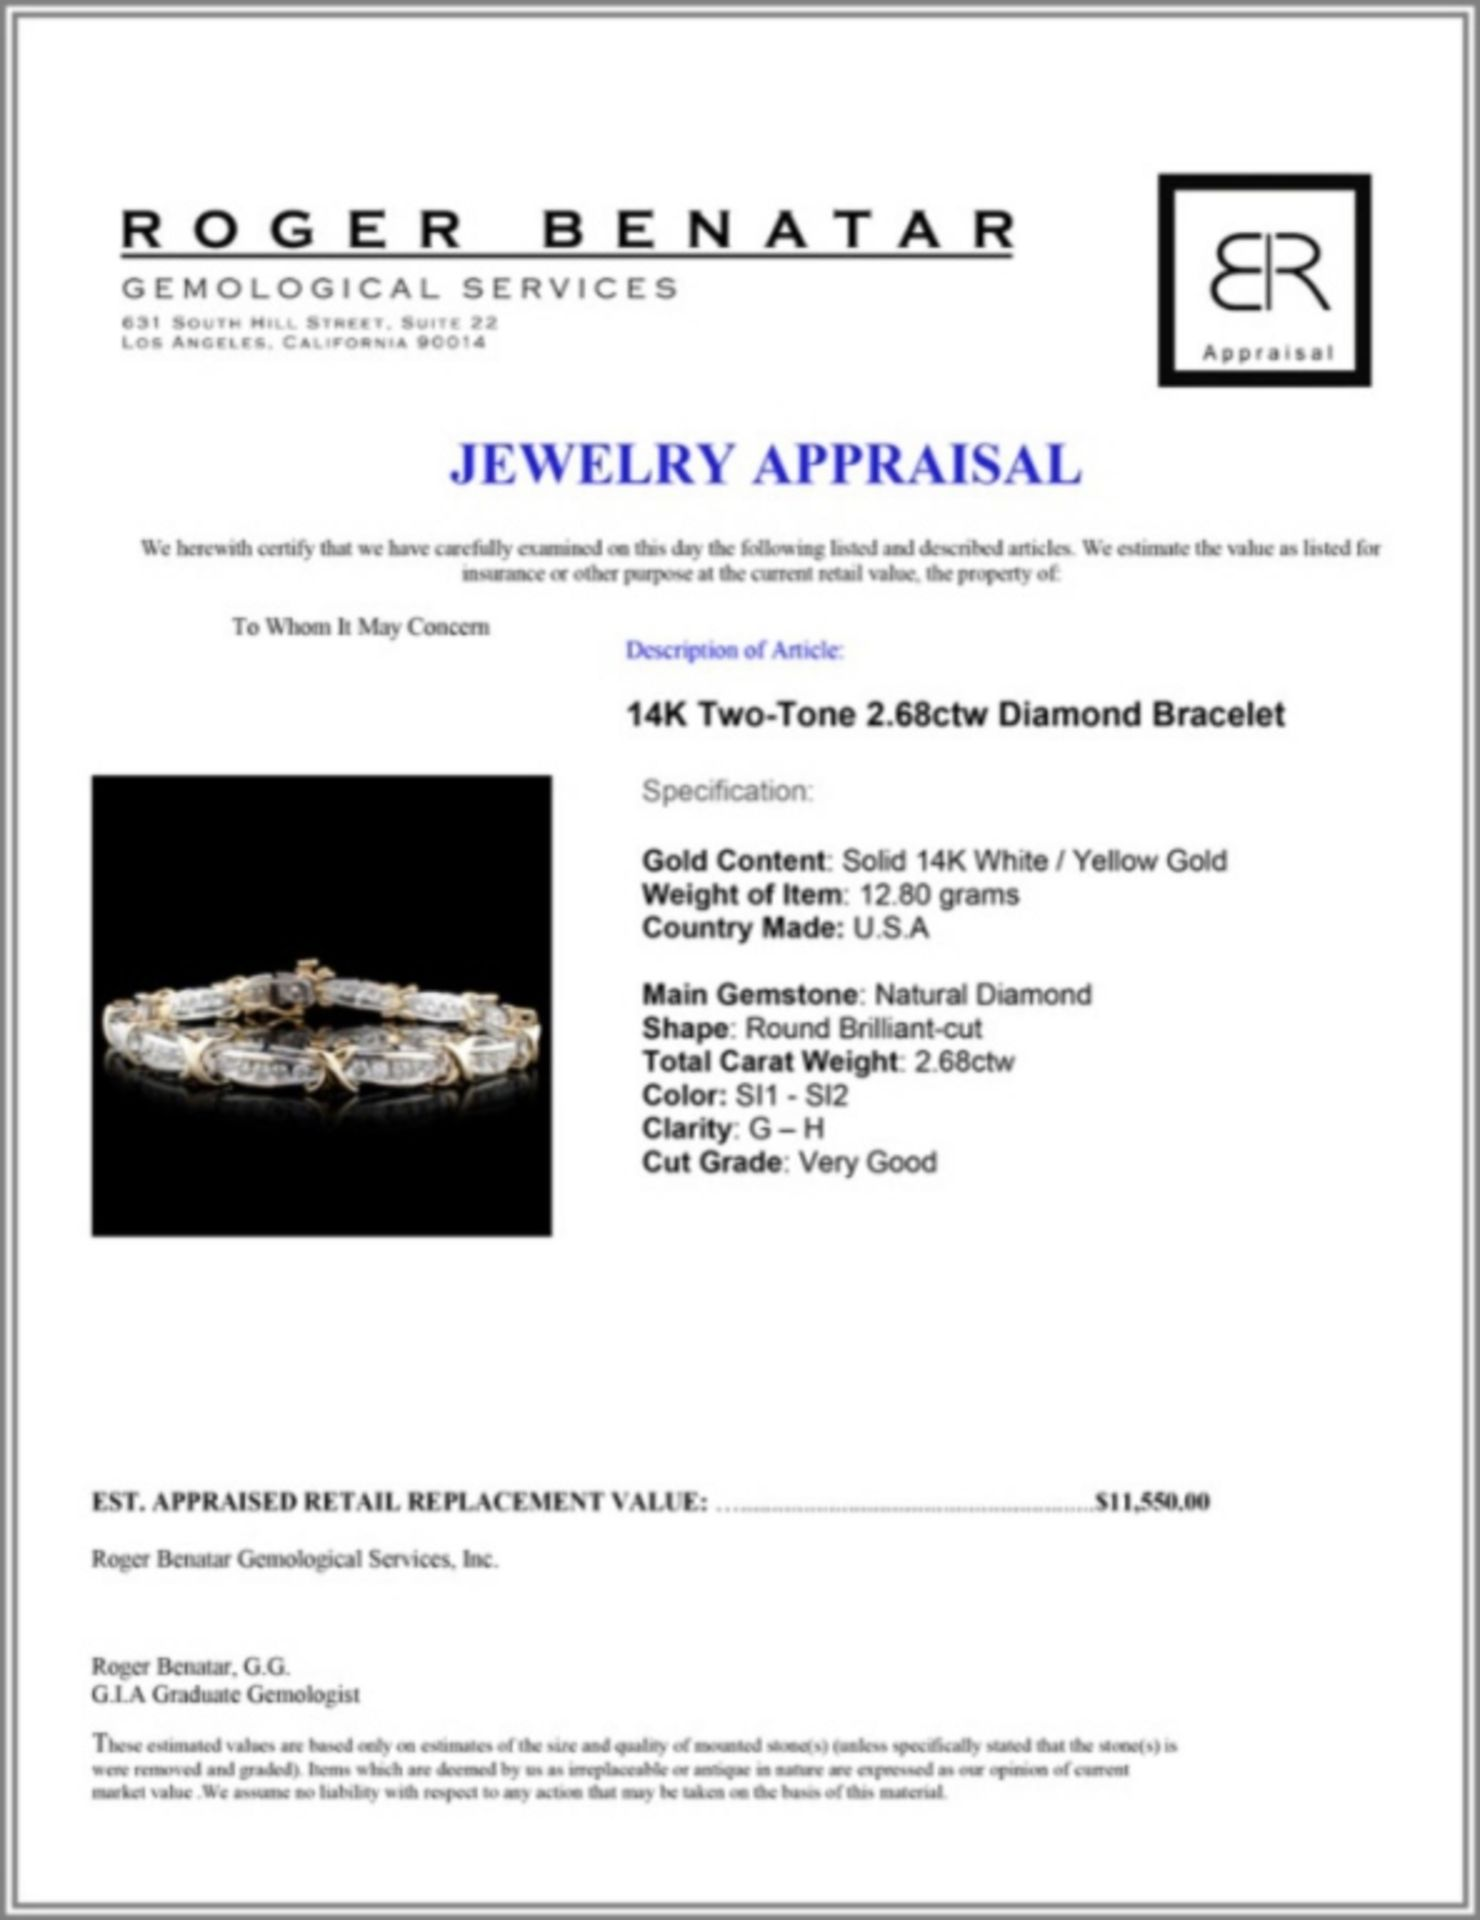 14K Two-Tone 2.68ctw Diamond Bracelet - Image 3 of 3